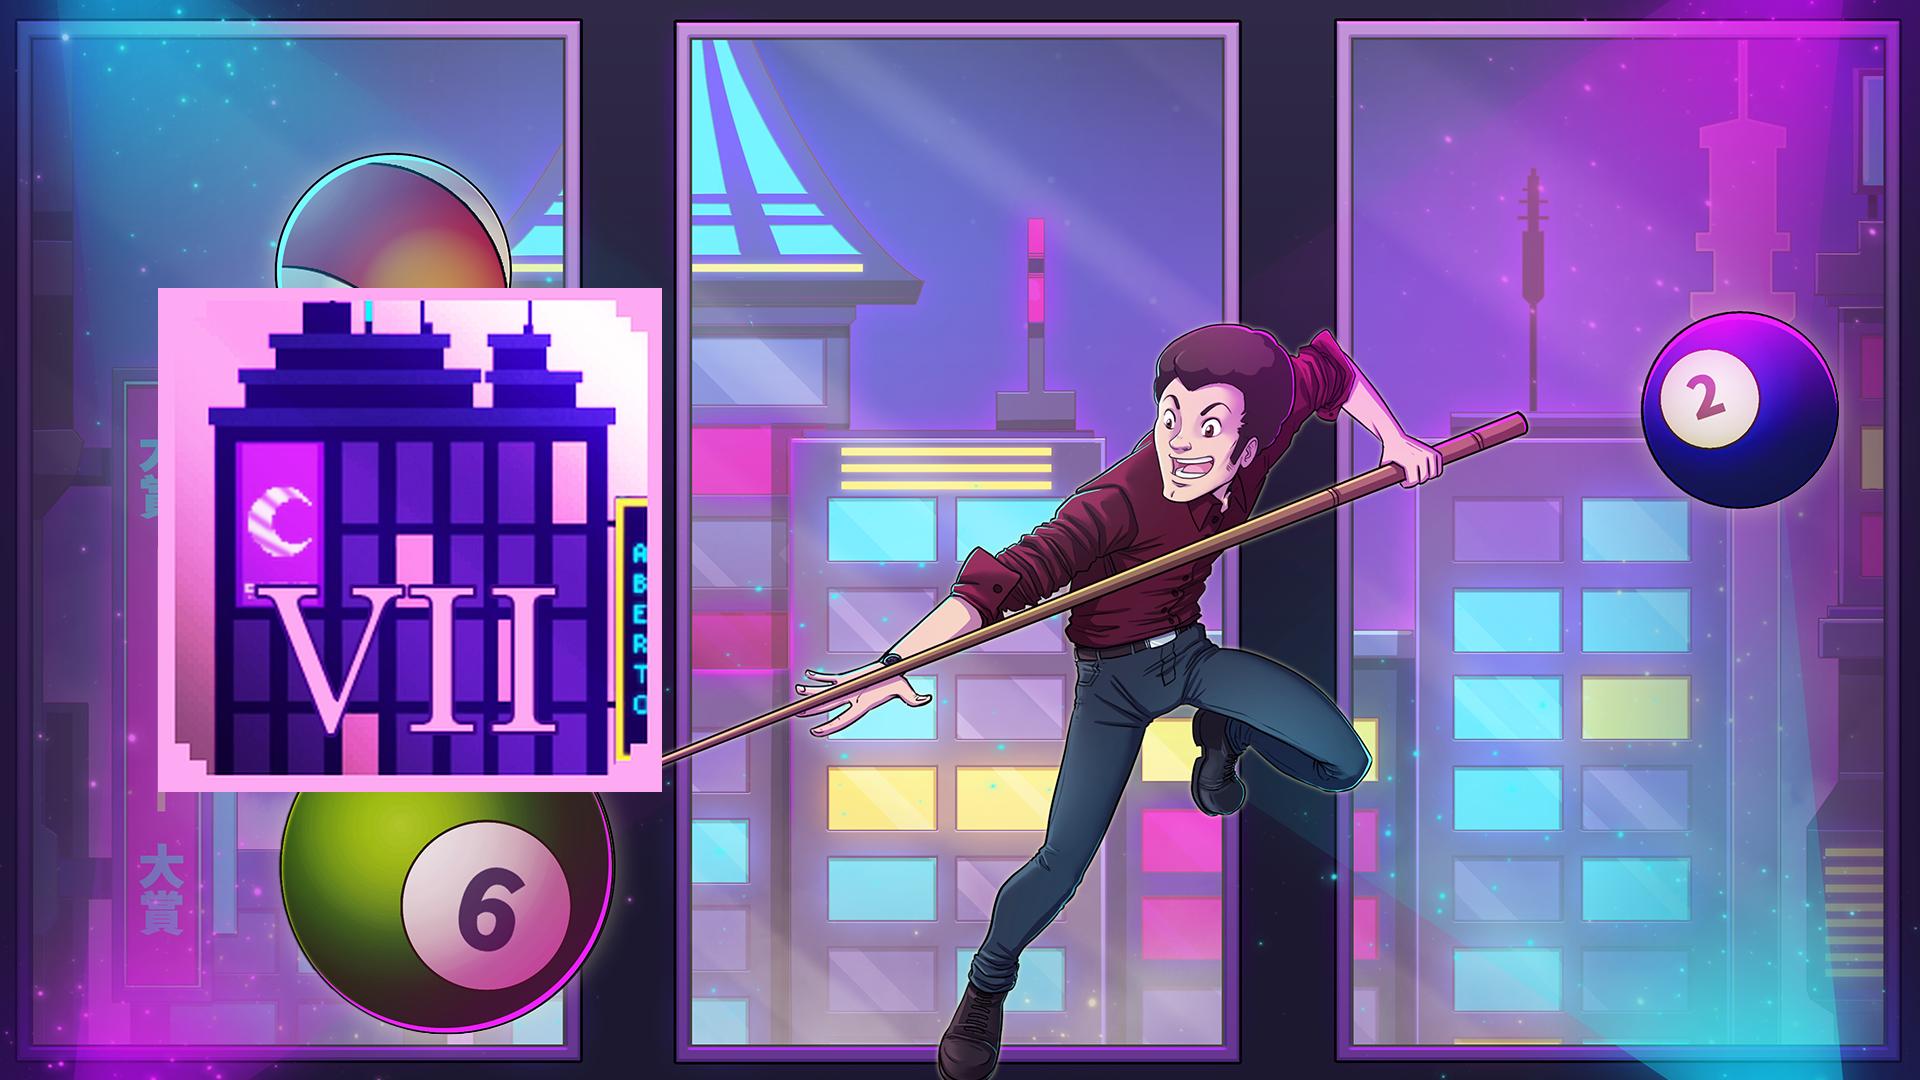 Icon for Level Master VII